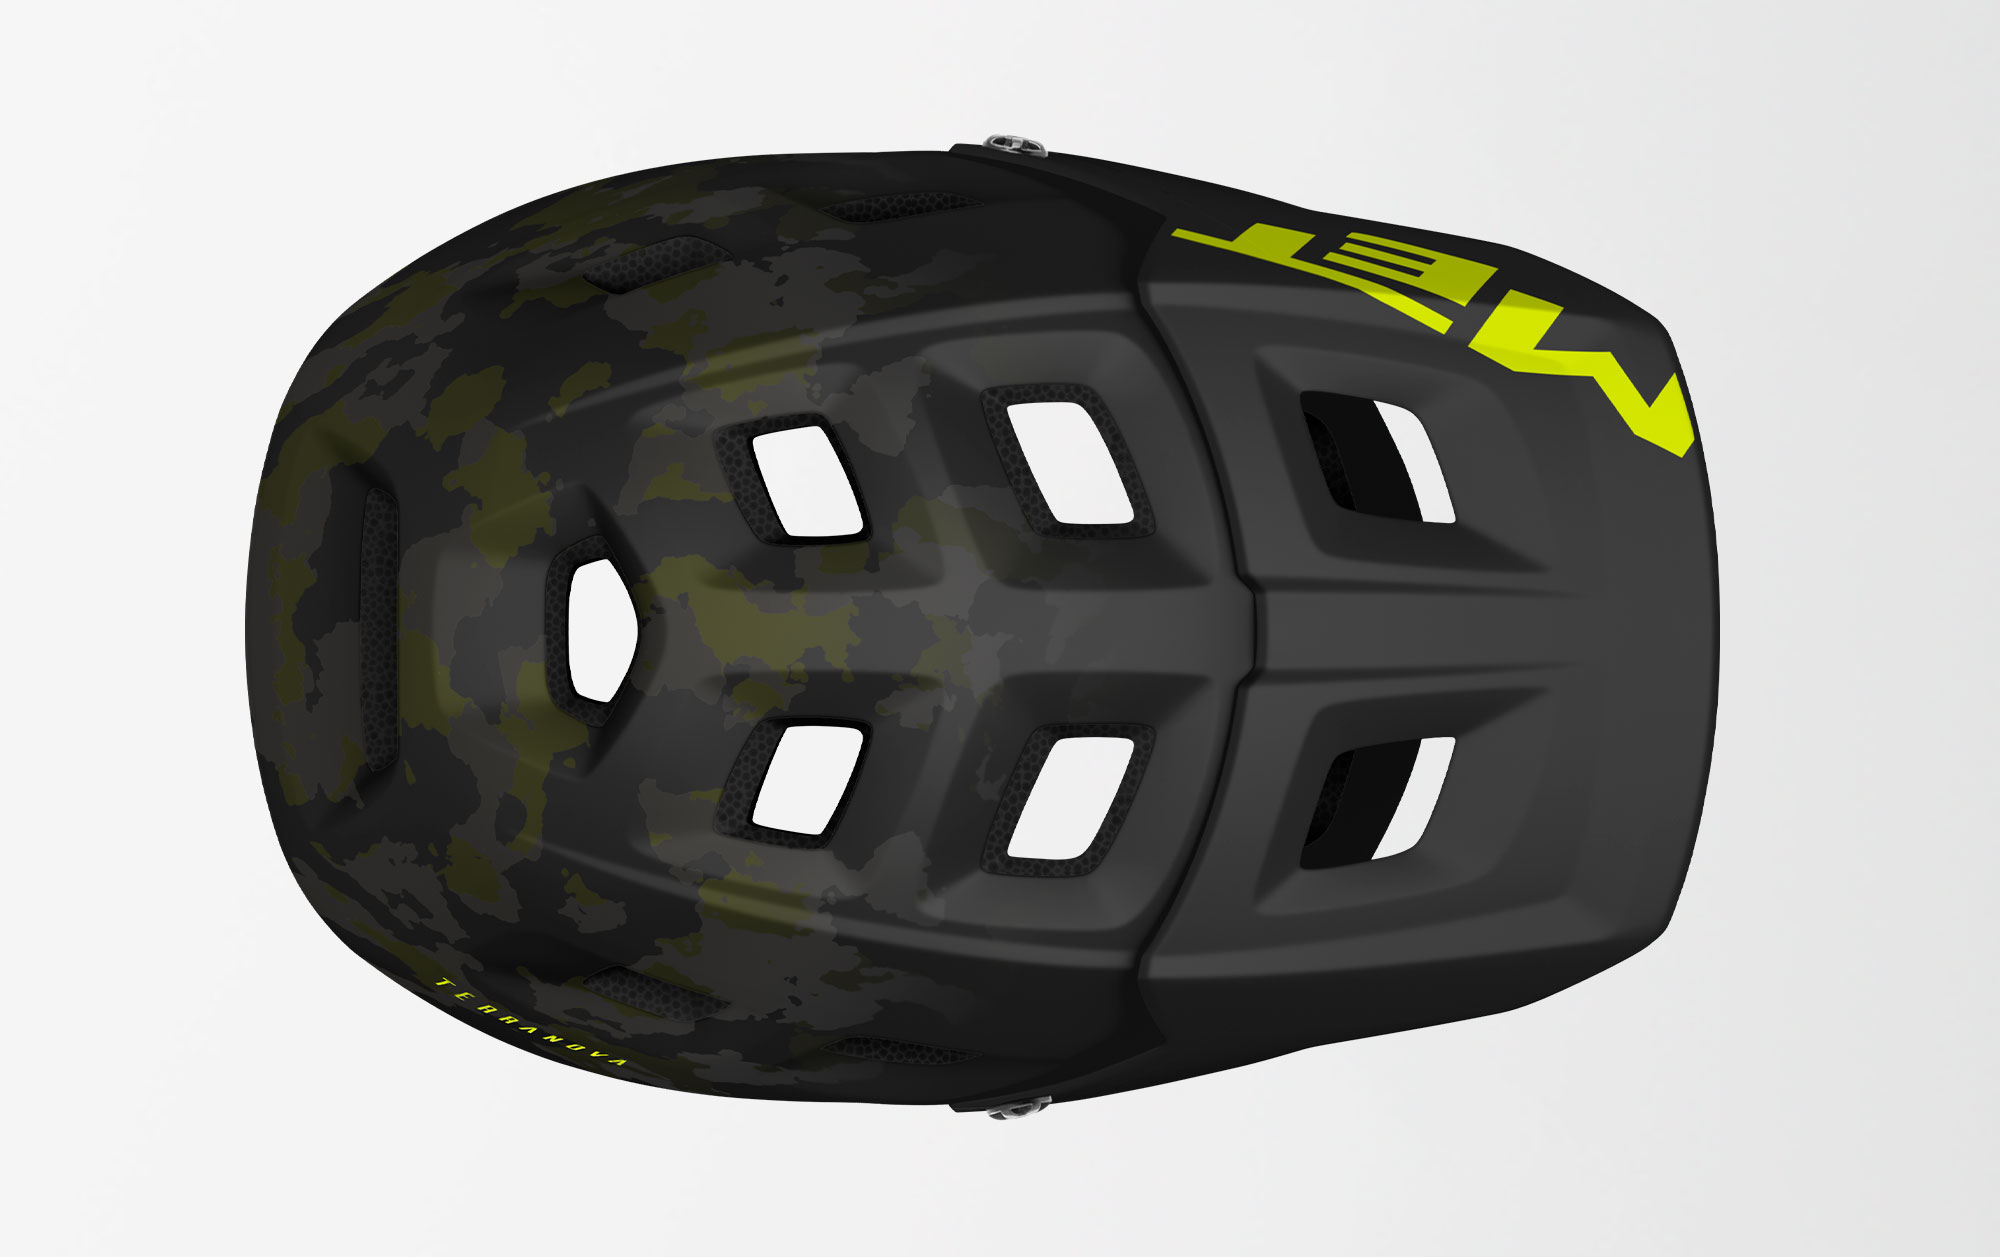 MET Terranova Mips Trail and E-MTB Helmet Ventilation